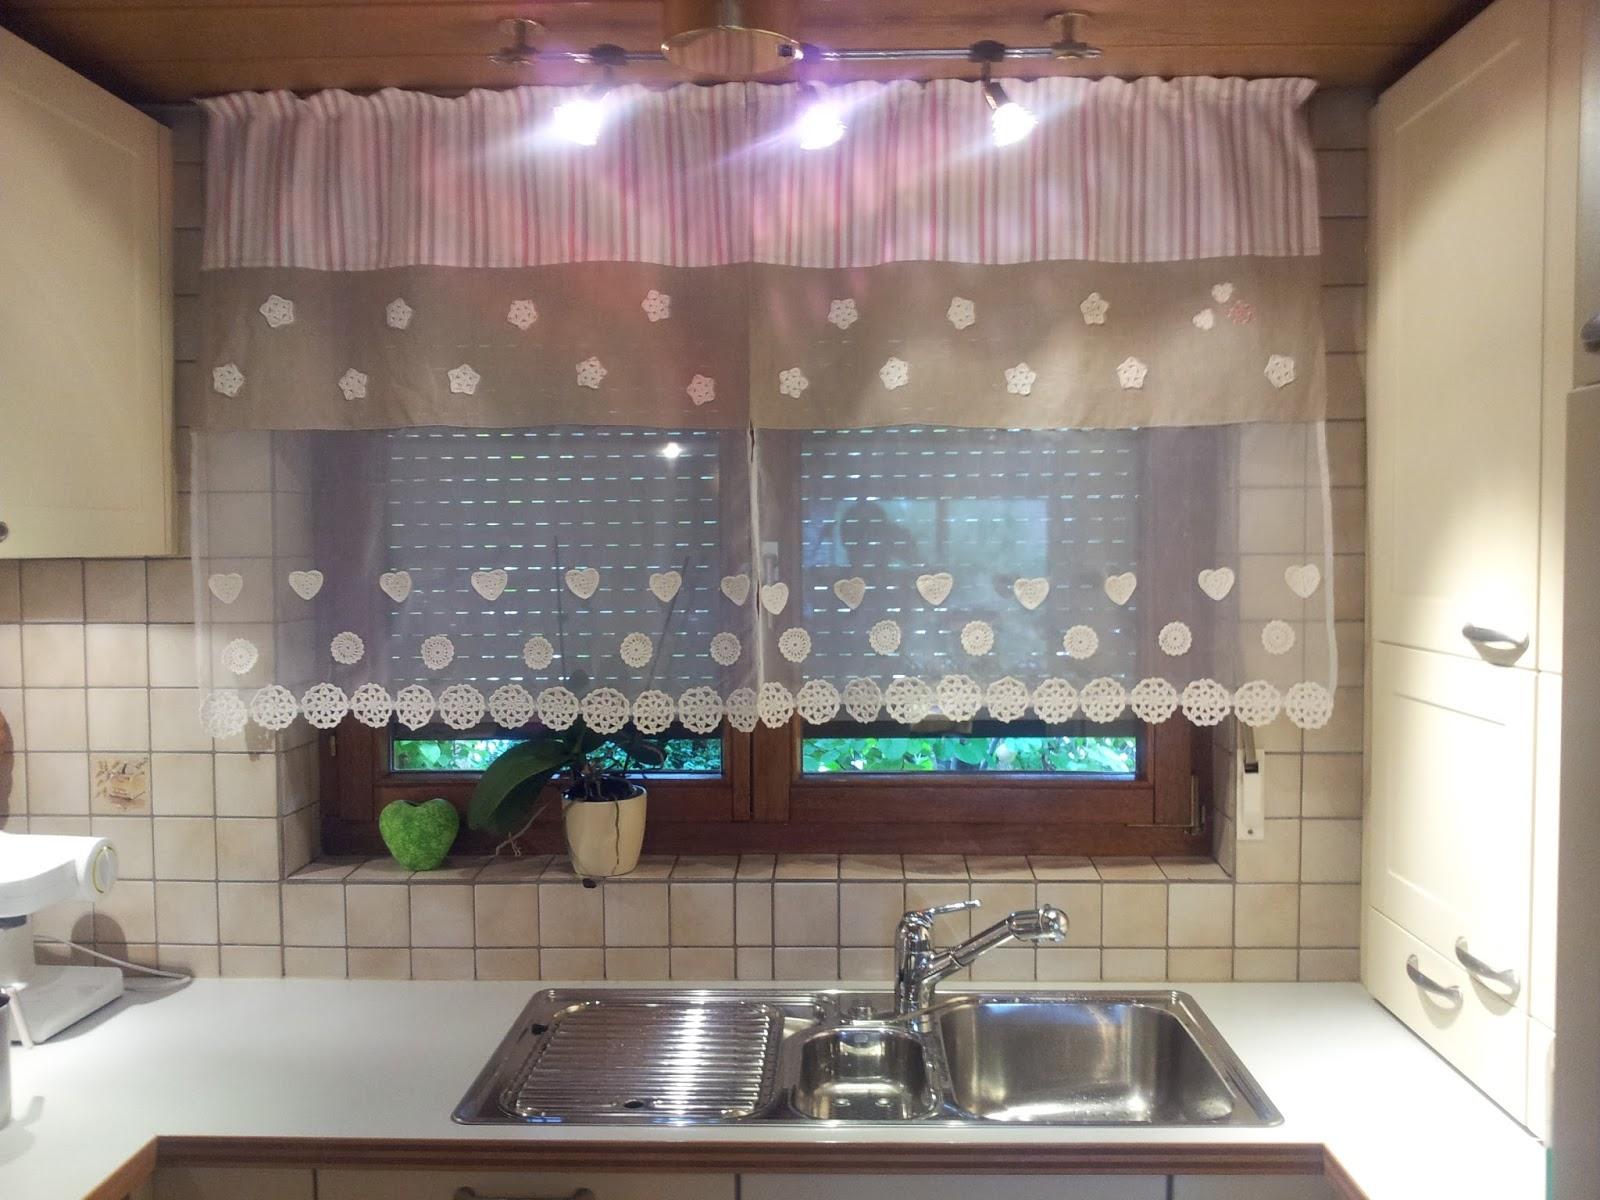 Küchengardinen Ikea inspirierend kuechengardinen ikea design